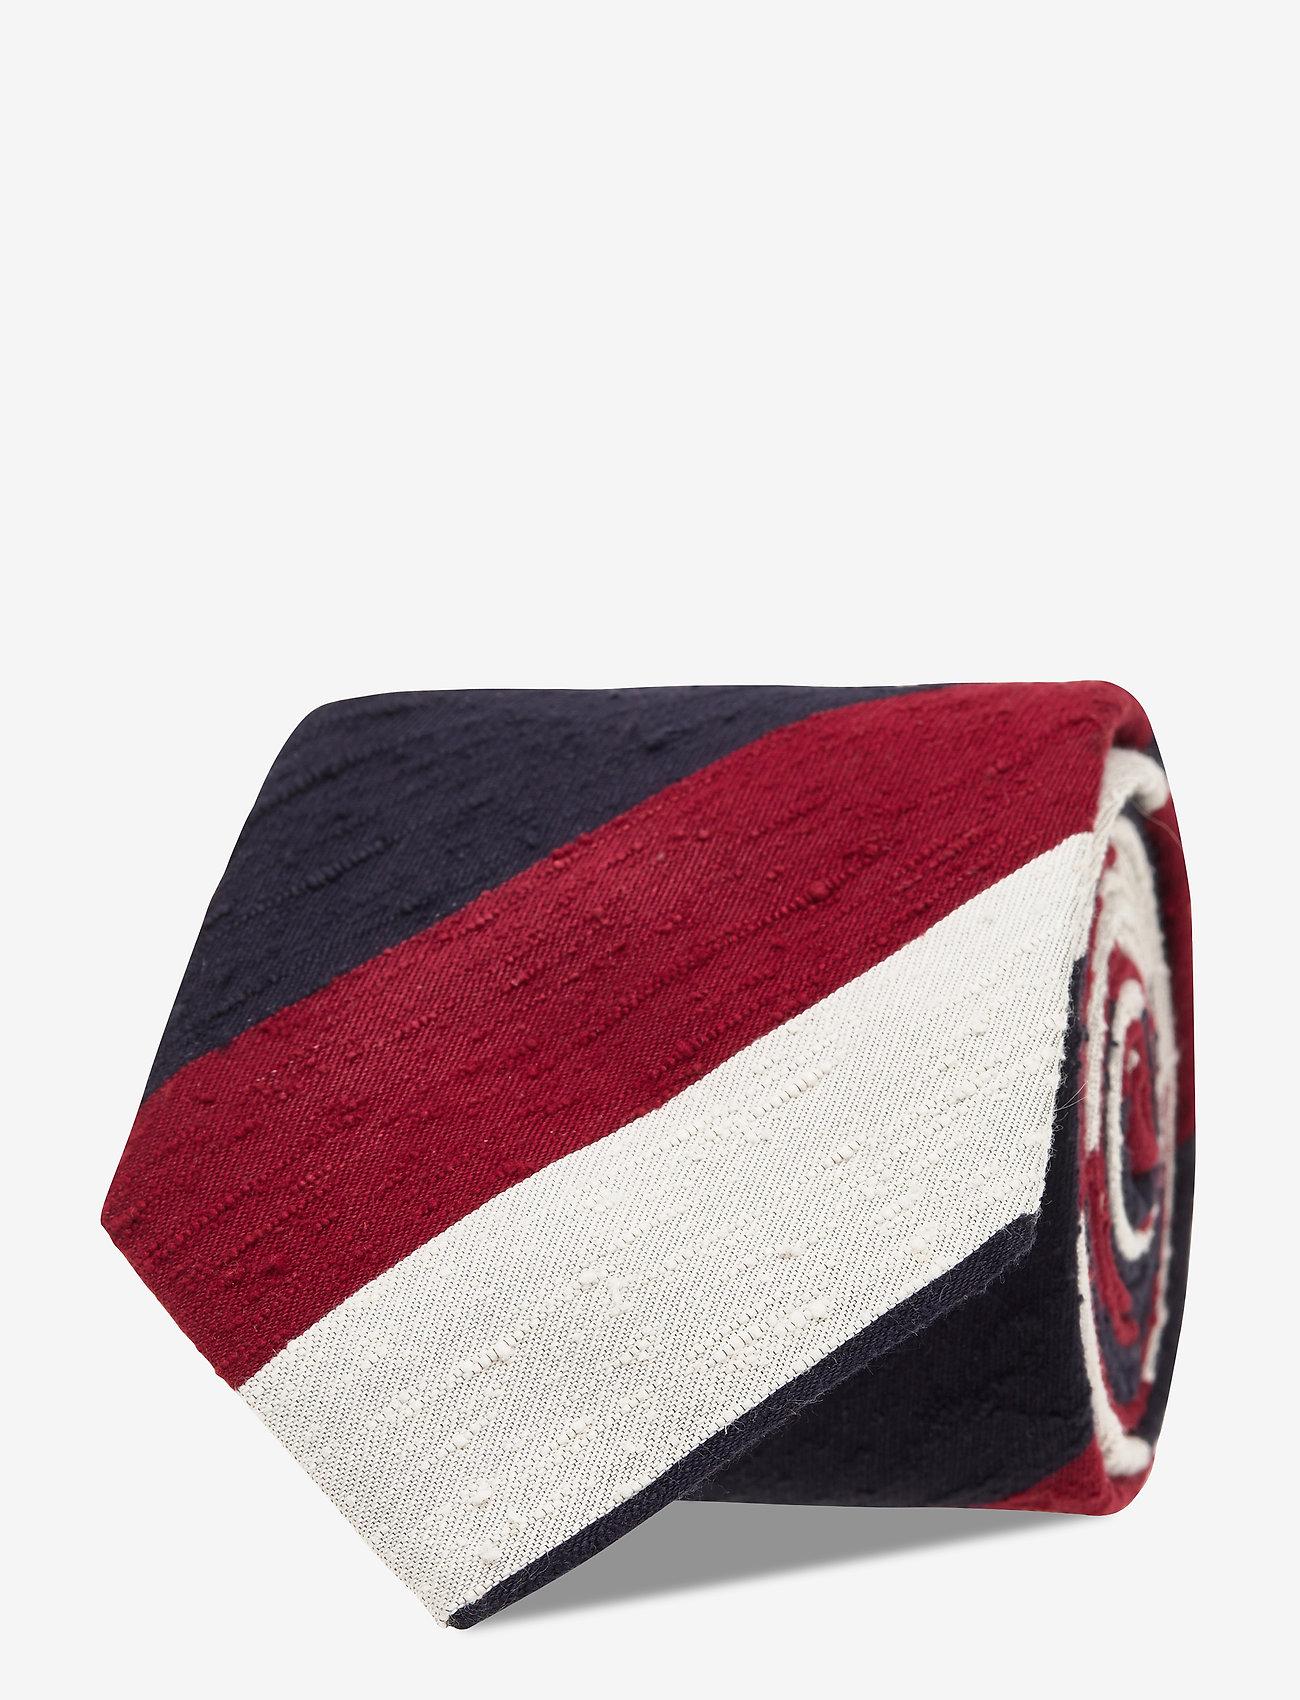 An Ivy - Navy Red White Block Shantung Tie - cravates - navy/red/white - 1